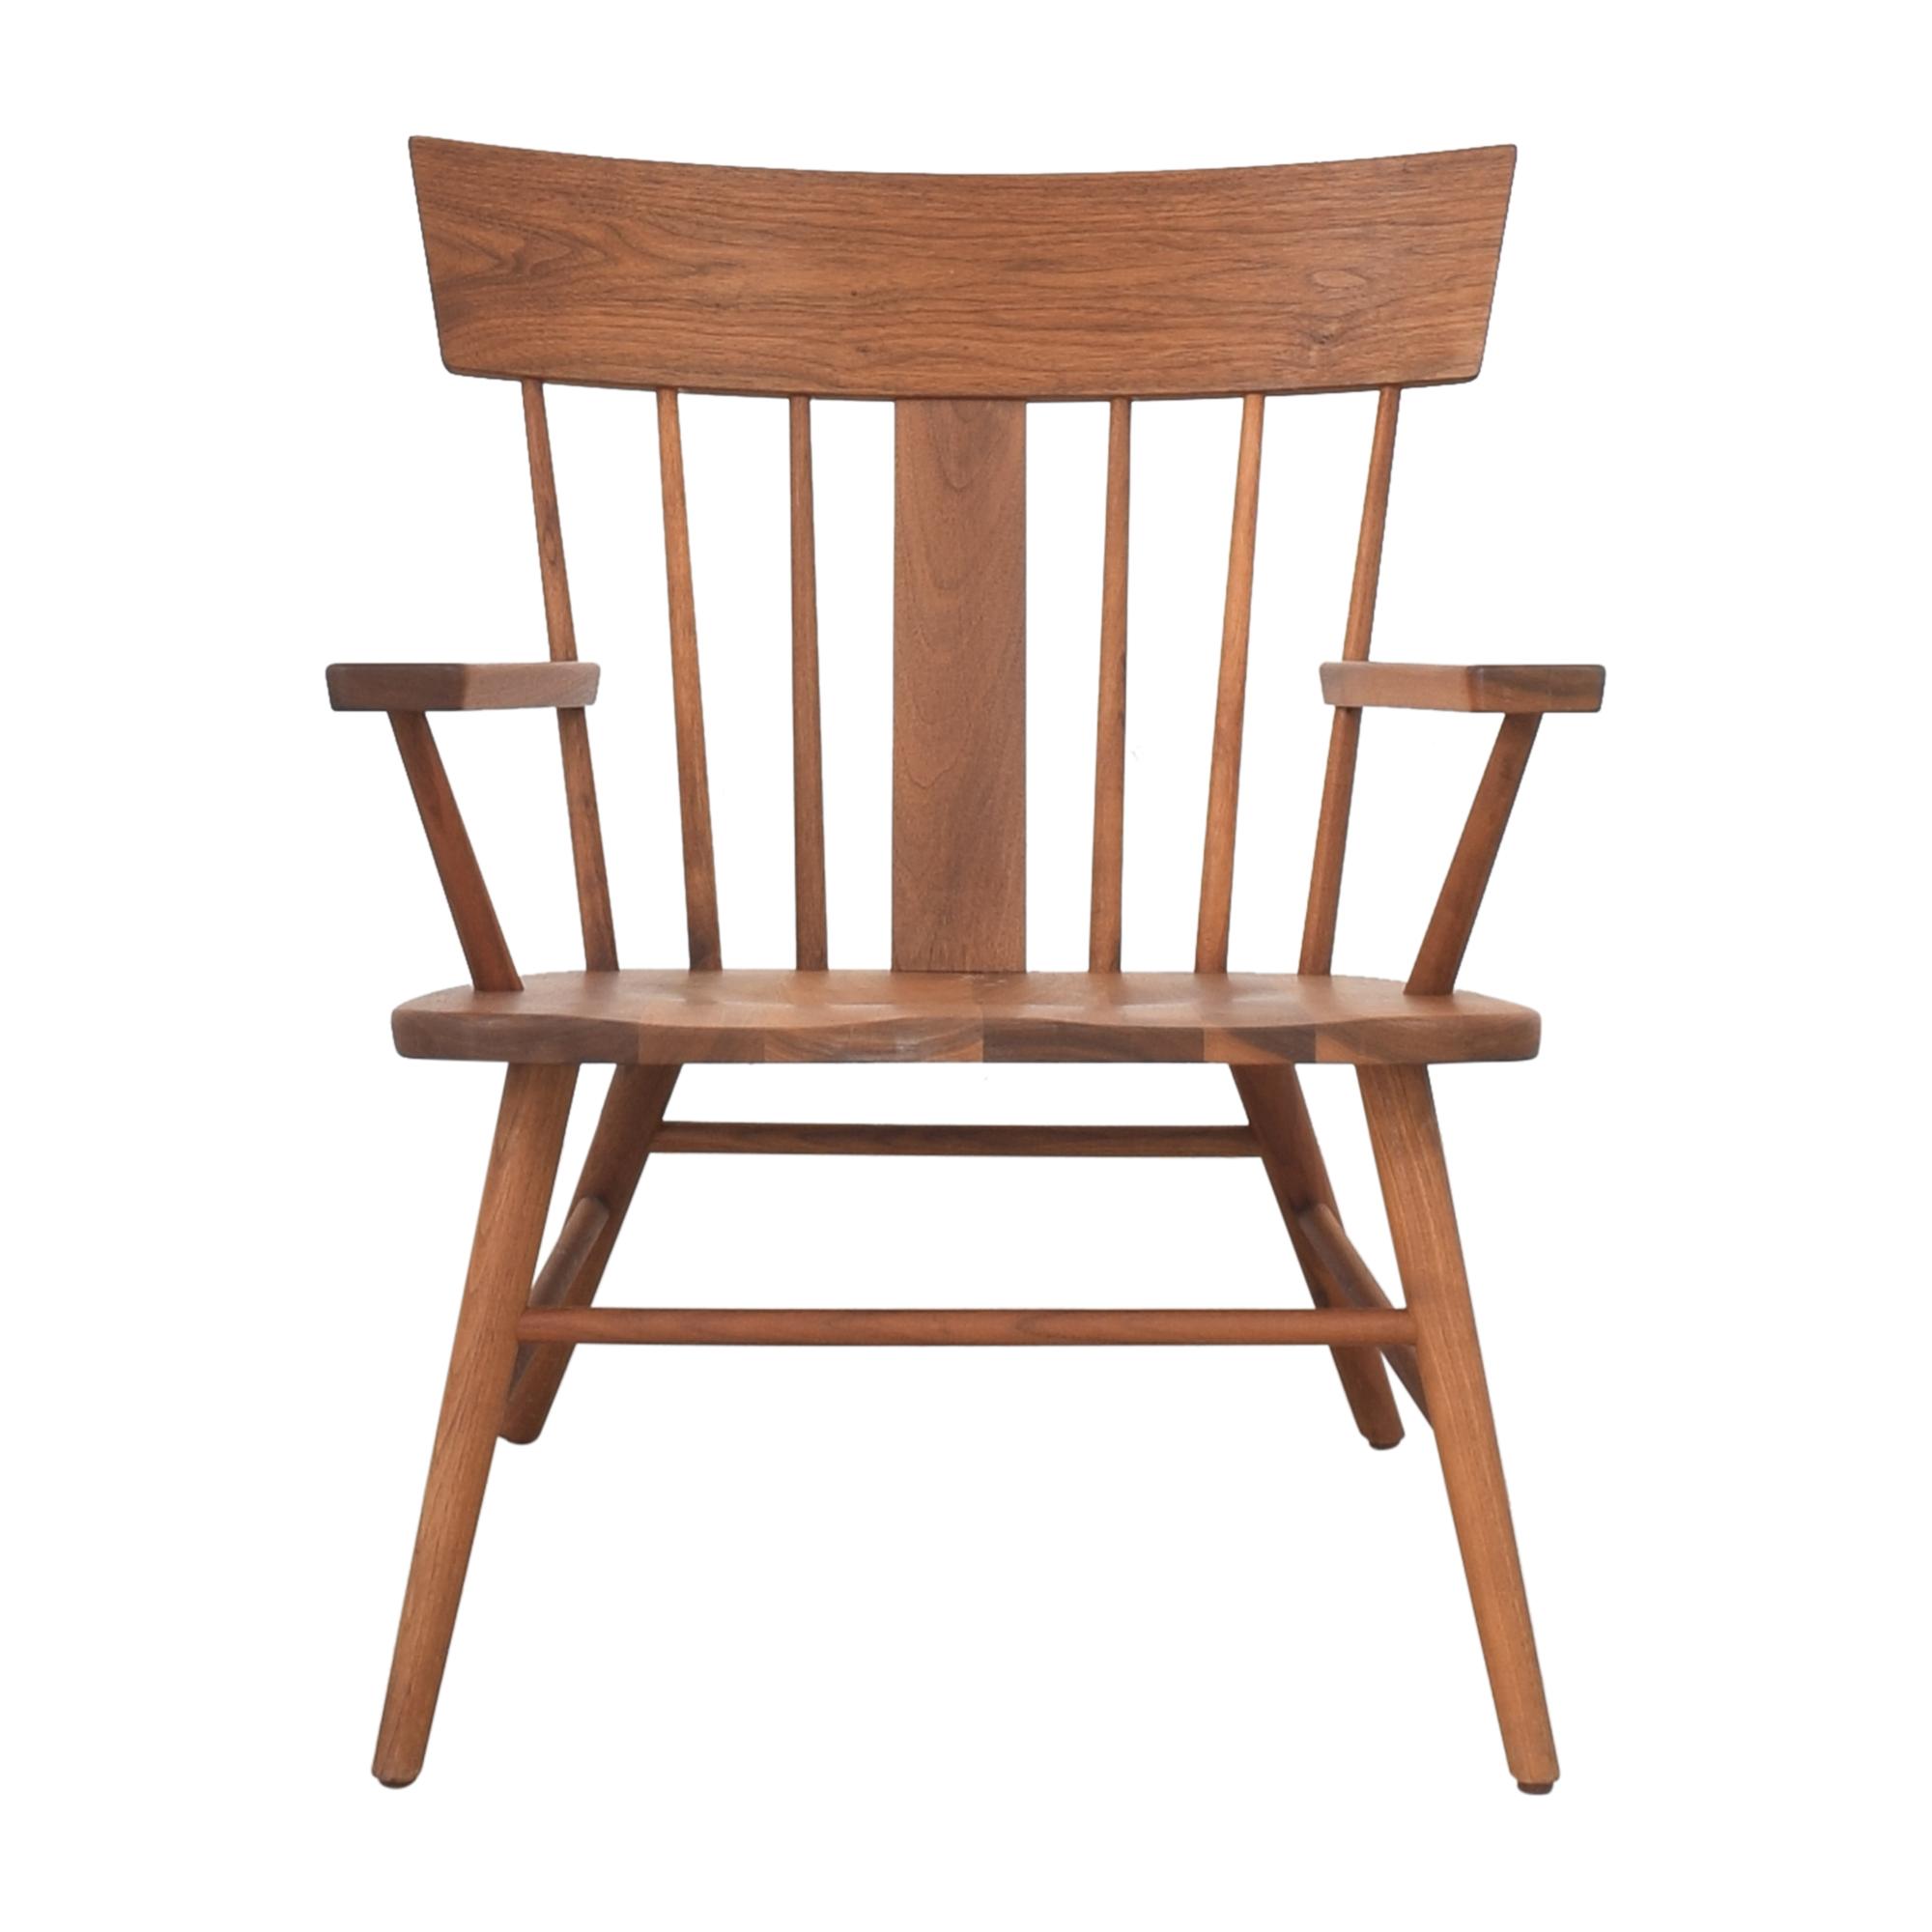 buy Room & Board Sandberg Chair Room & Board Chairs